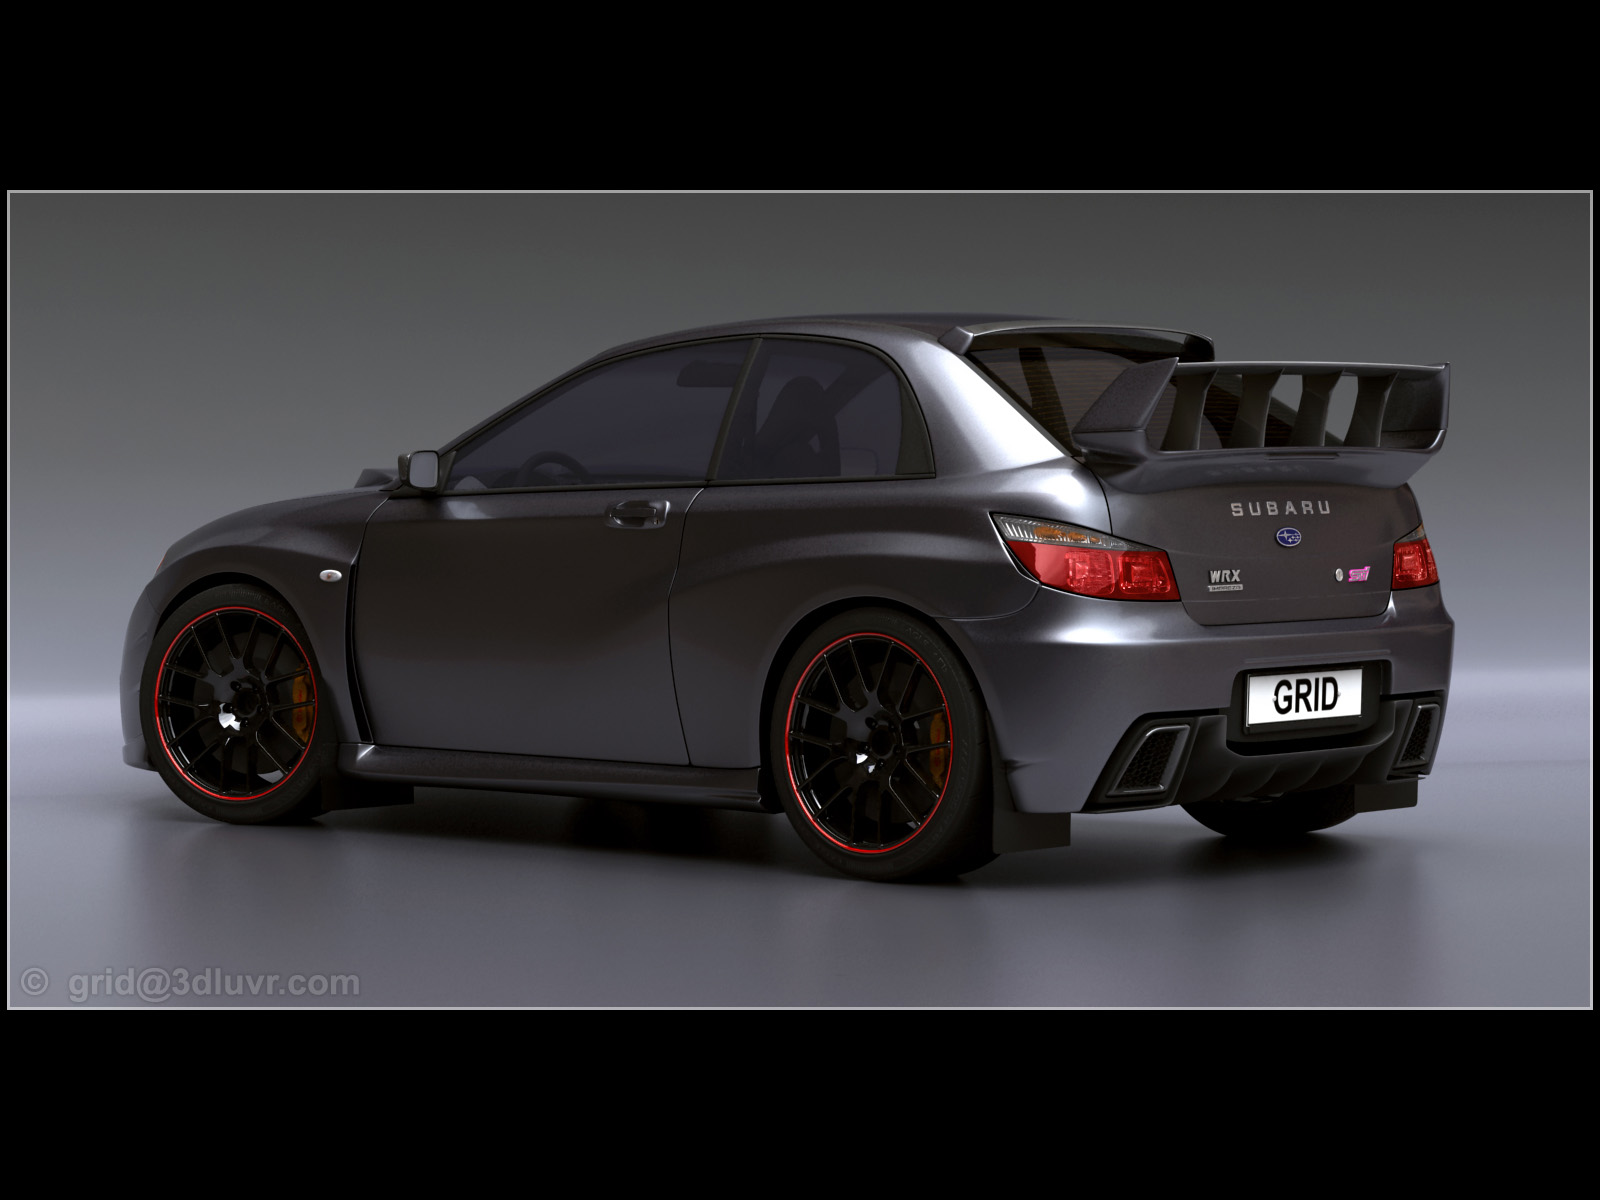 Subaru Impreza Wrx Sti Photos Photogallery With 56 Pics